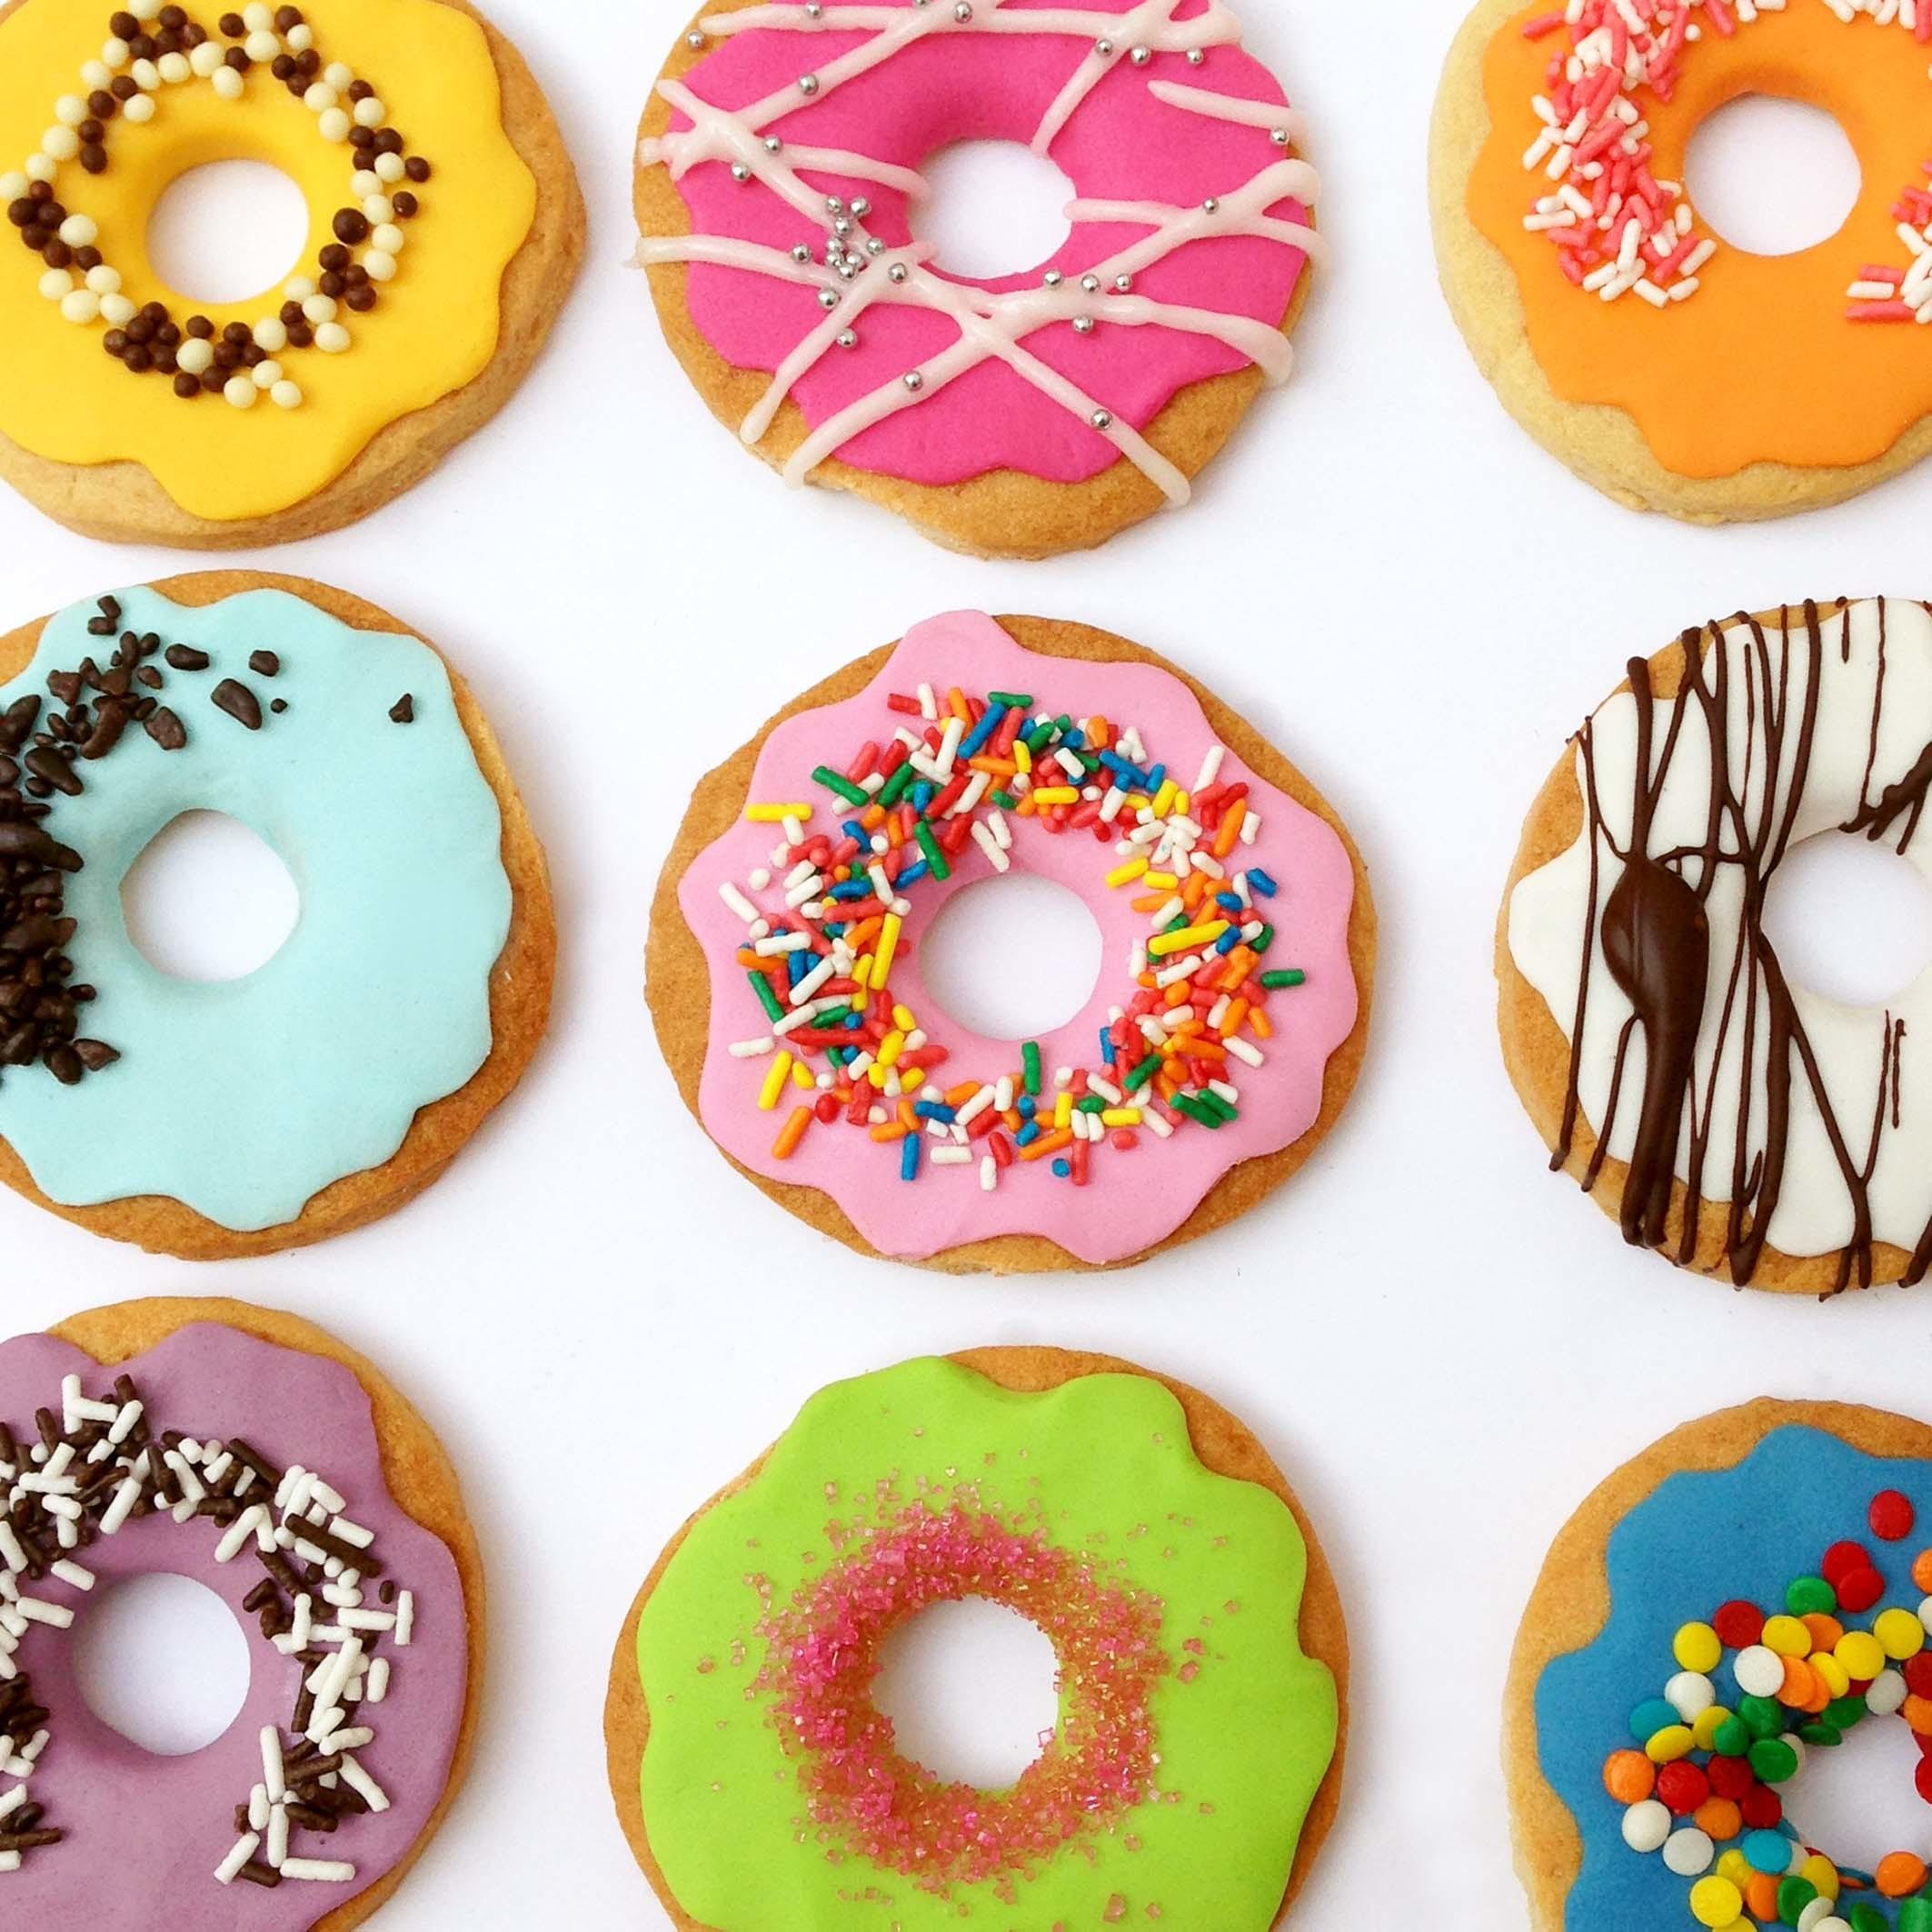 Colorful Fondant Donut Cookies